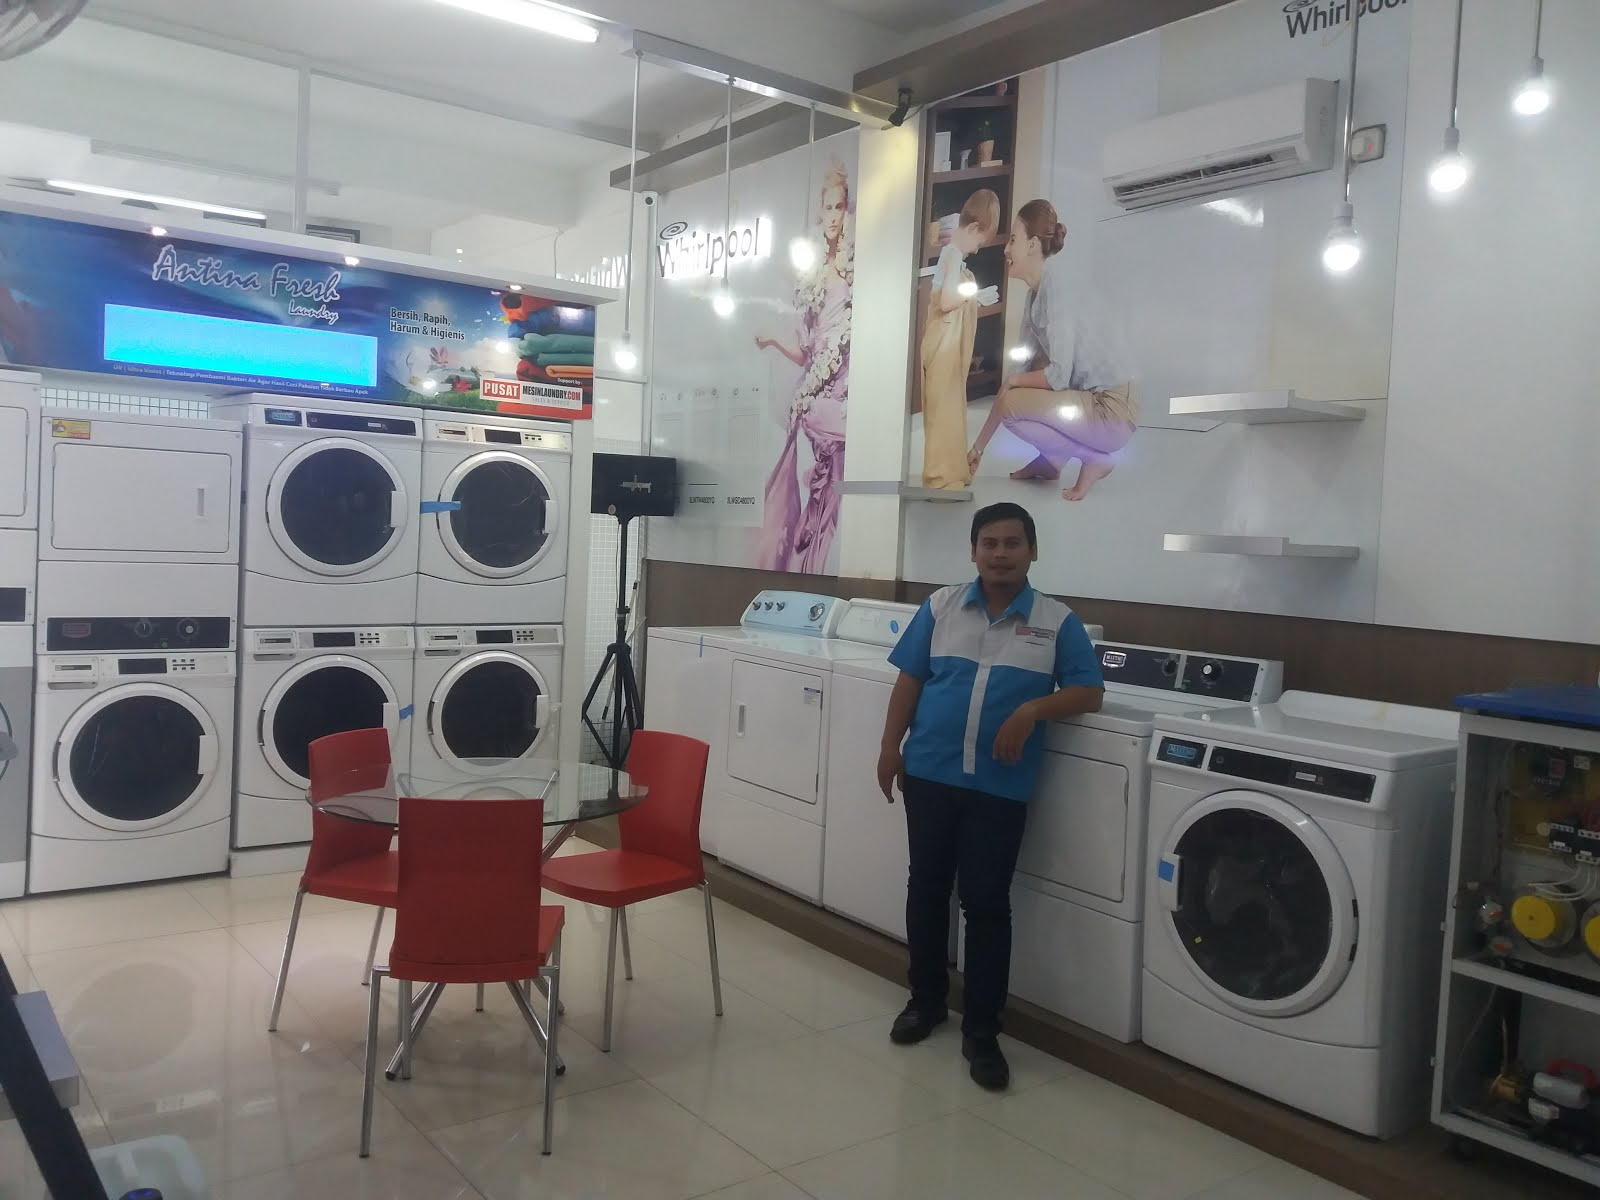 Mesin Laundry : Harga mesin cuci koin | Mesin Laundry Koin